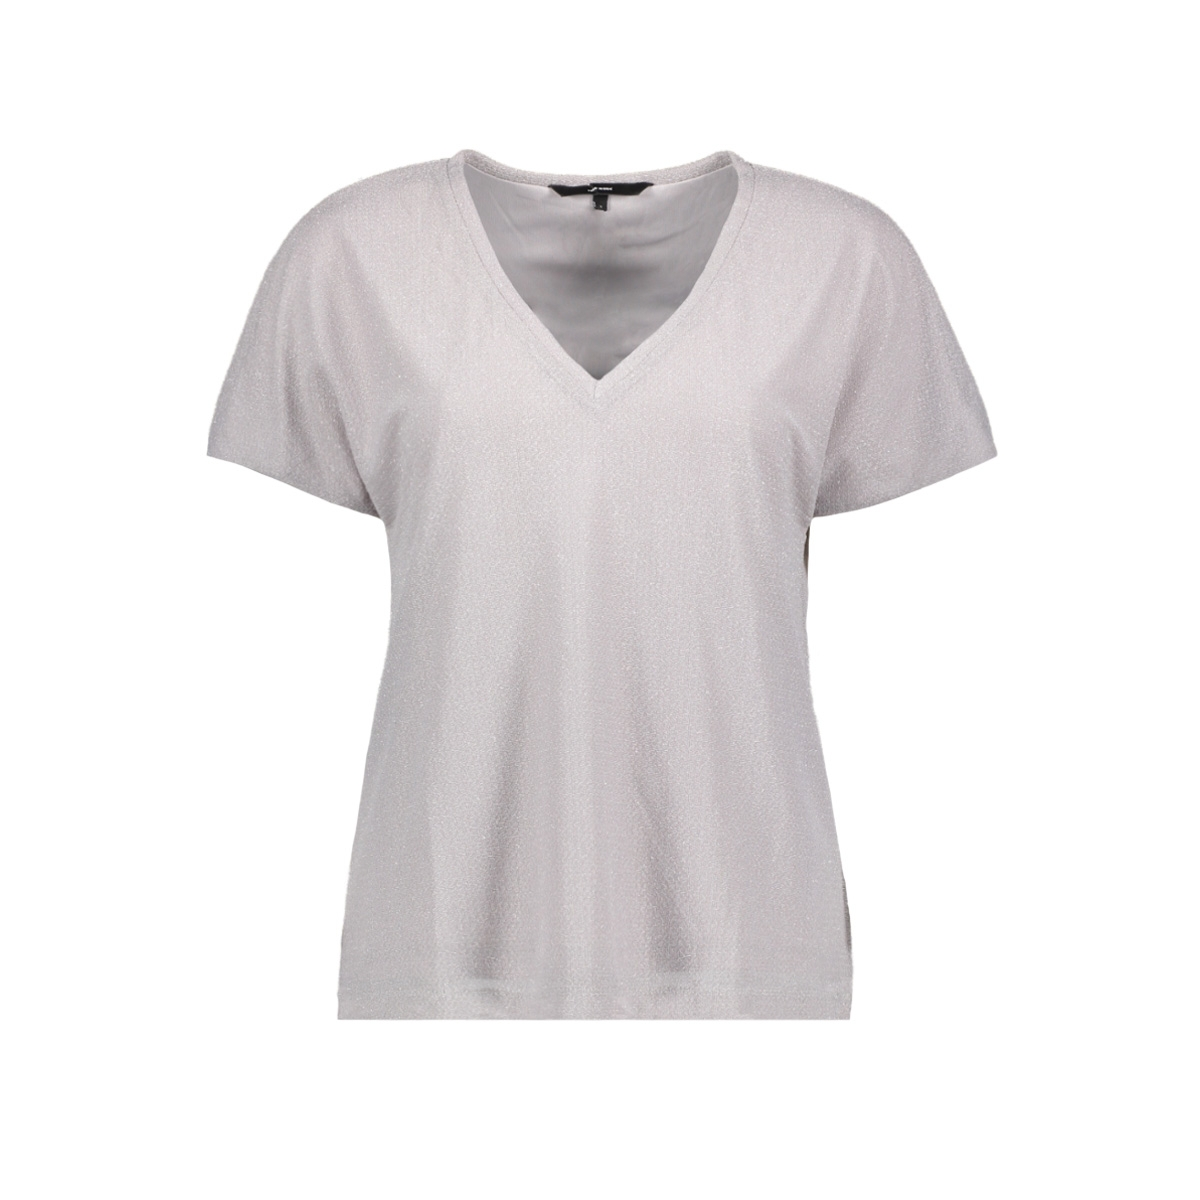 vmfransa wide v-neck top d2-8 10207123 vero moda t-shirt silver sconce/silver lurex